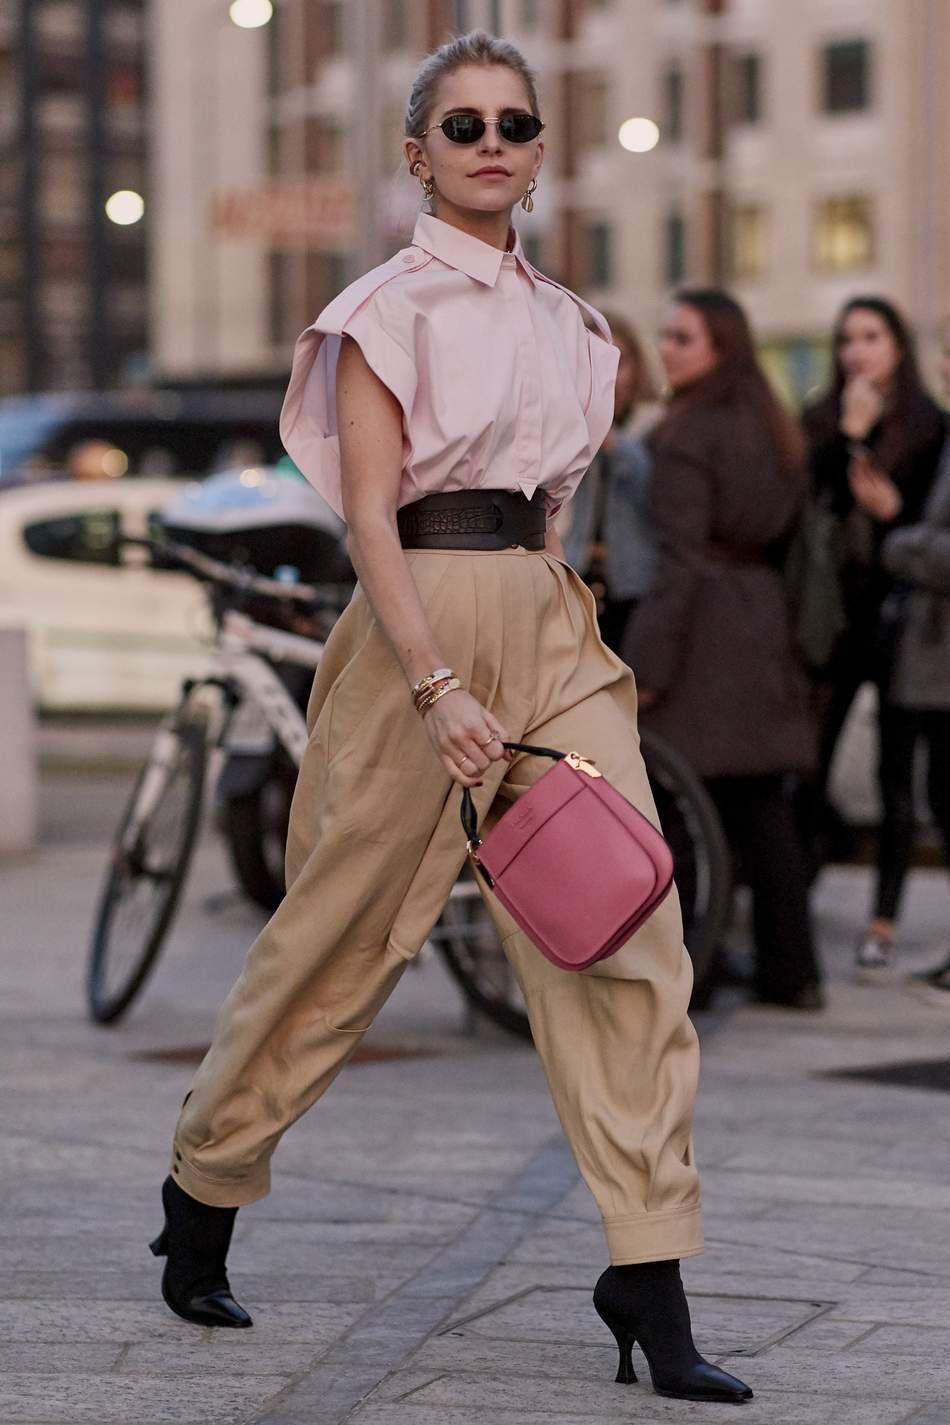 Street Style Looks From Milan Fashion Week FW19